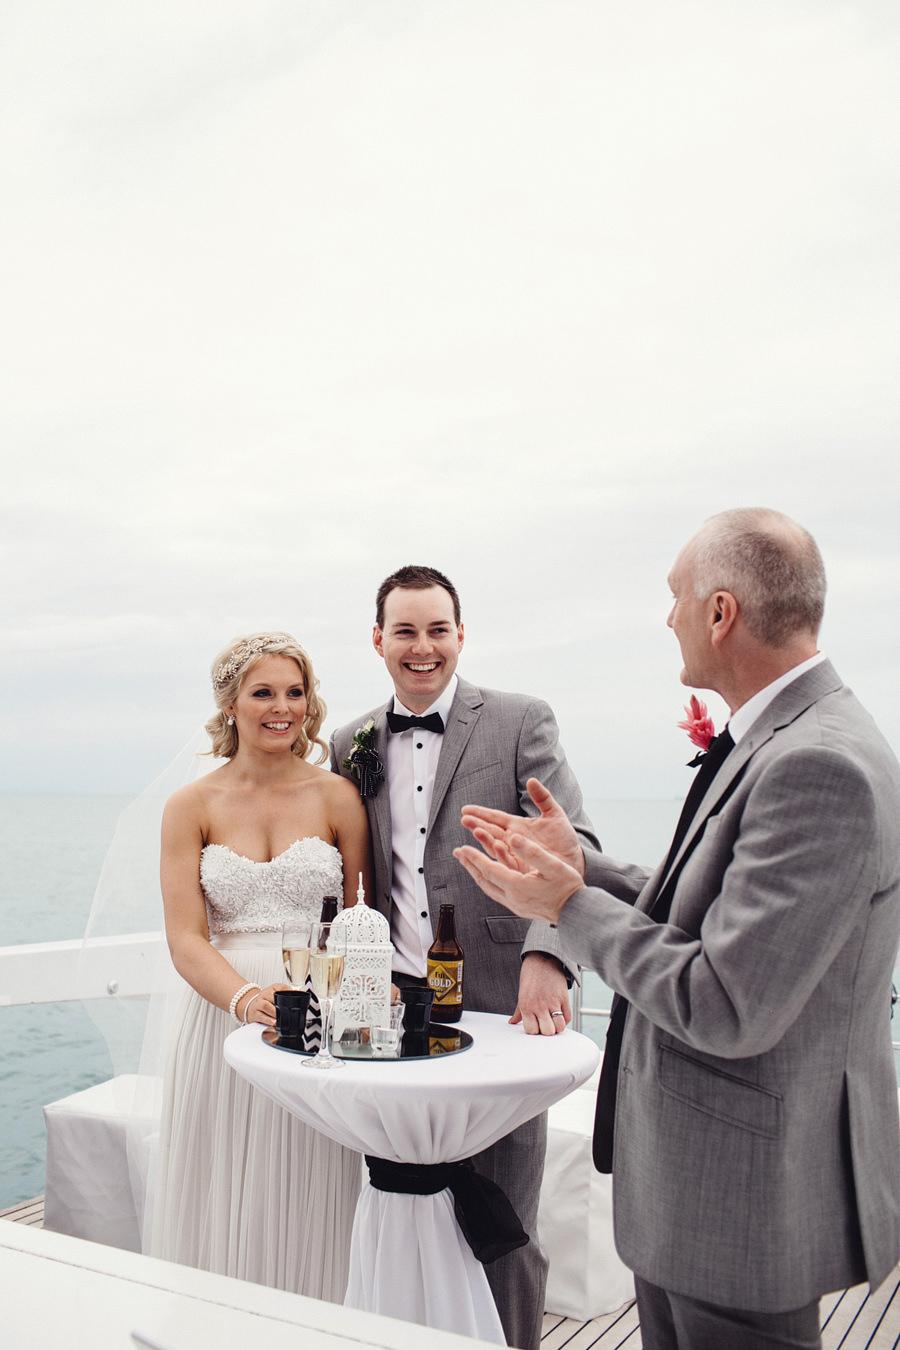 Nadi Bay Wedding Photographers: Reception